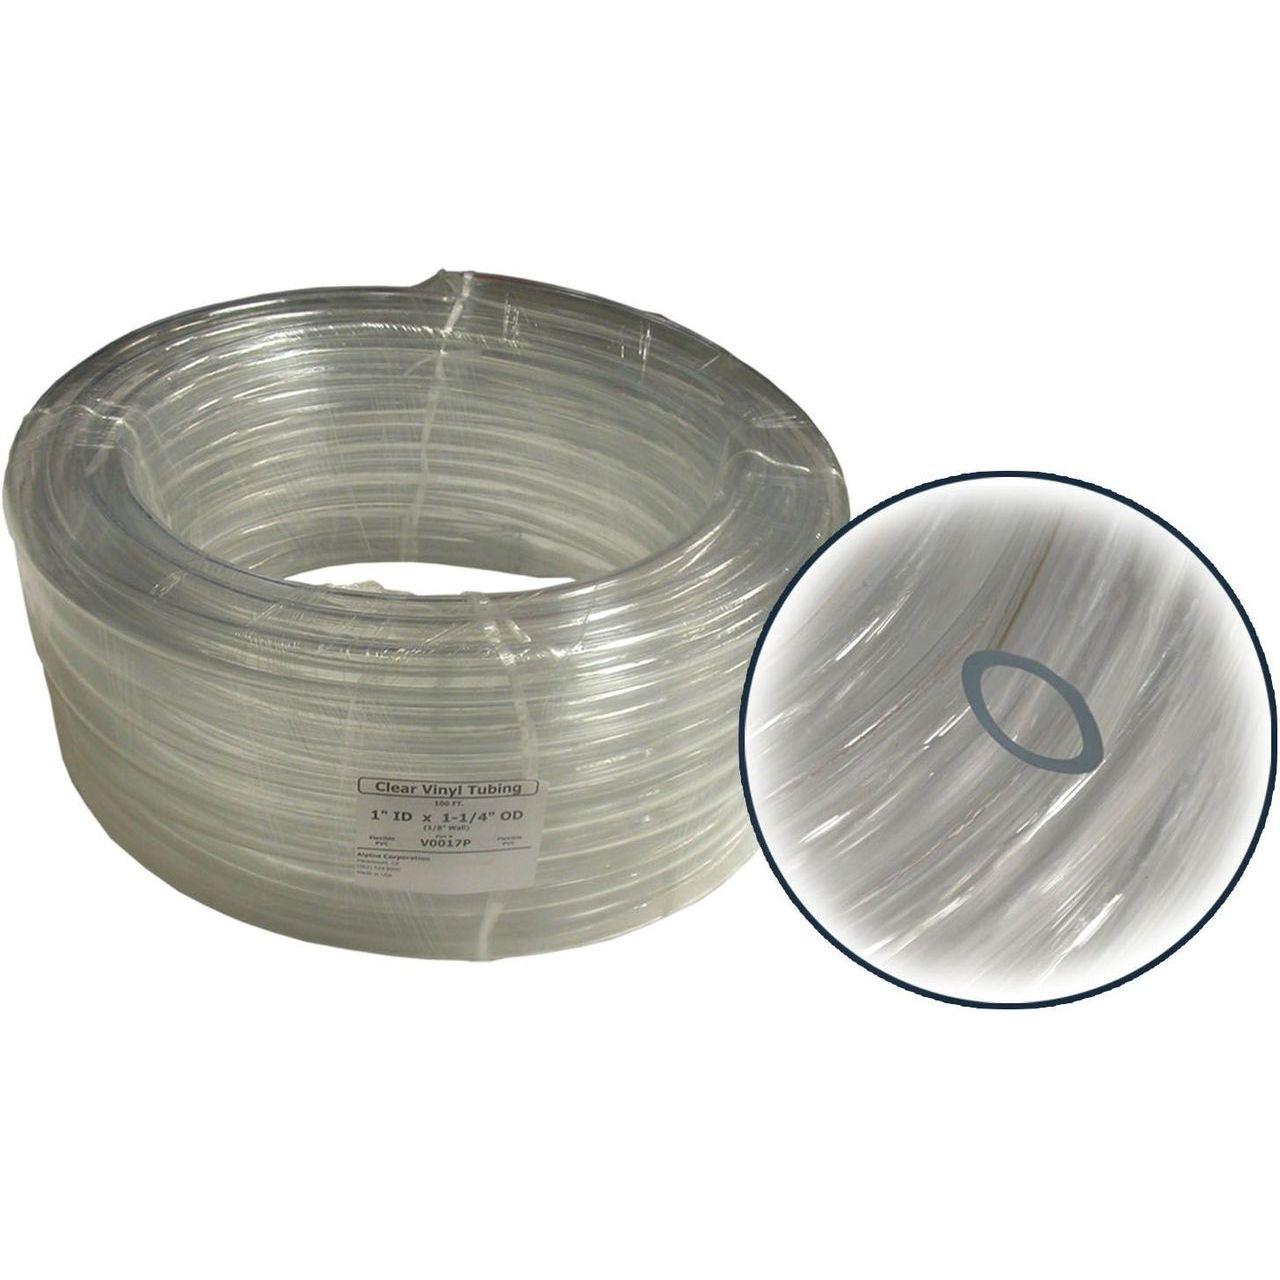 Alpine V0127P PVC Clear Tubing - 1/2'' ID x 3/4'' Wall x 100' Coil